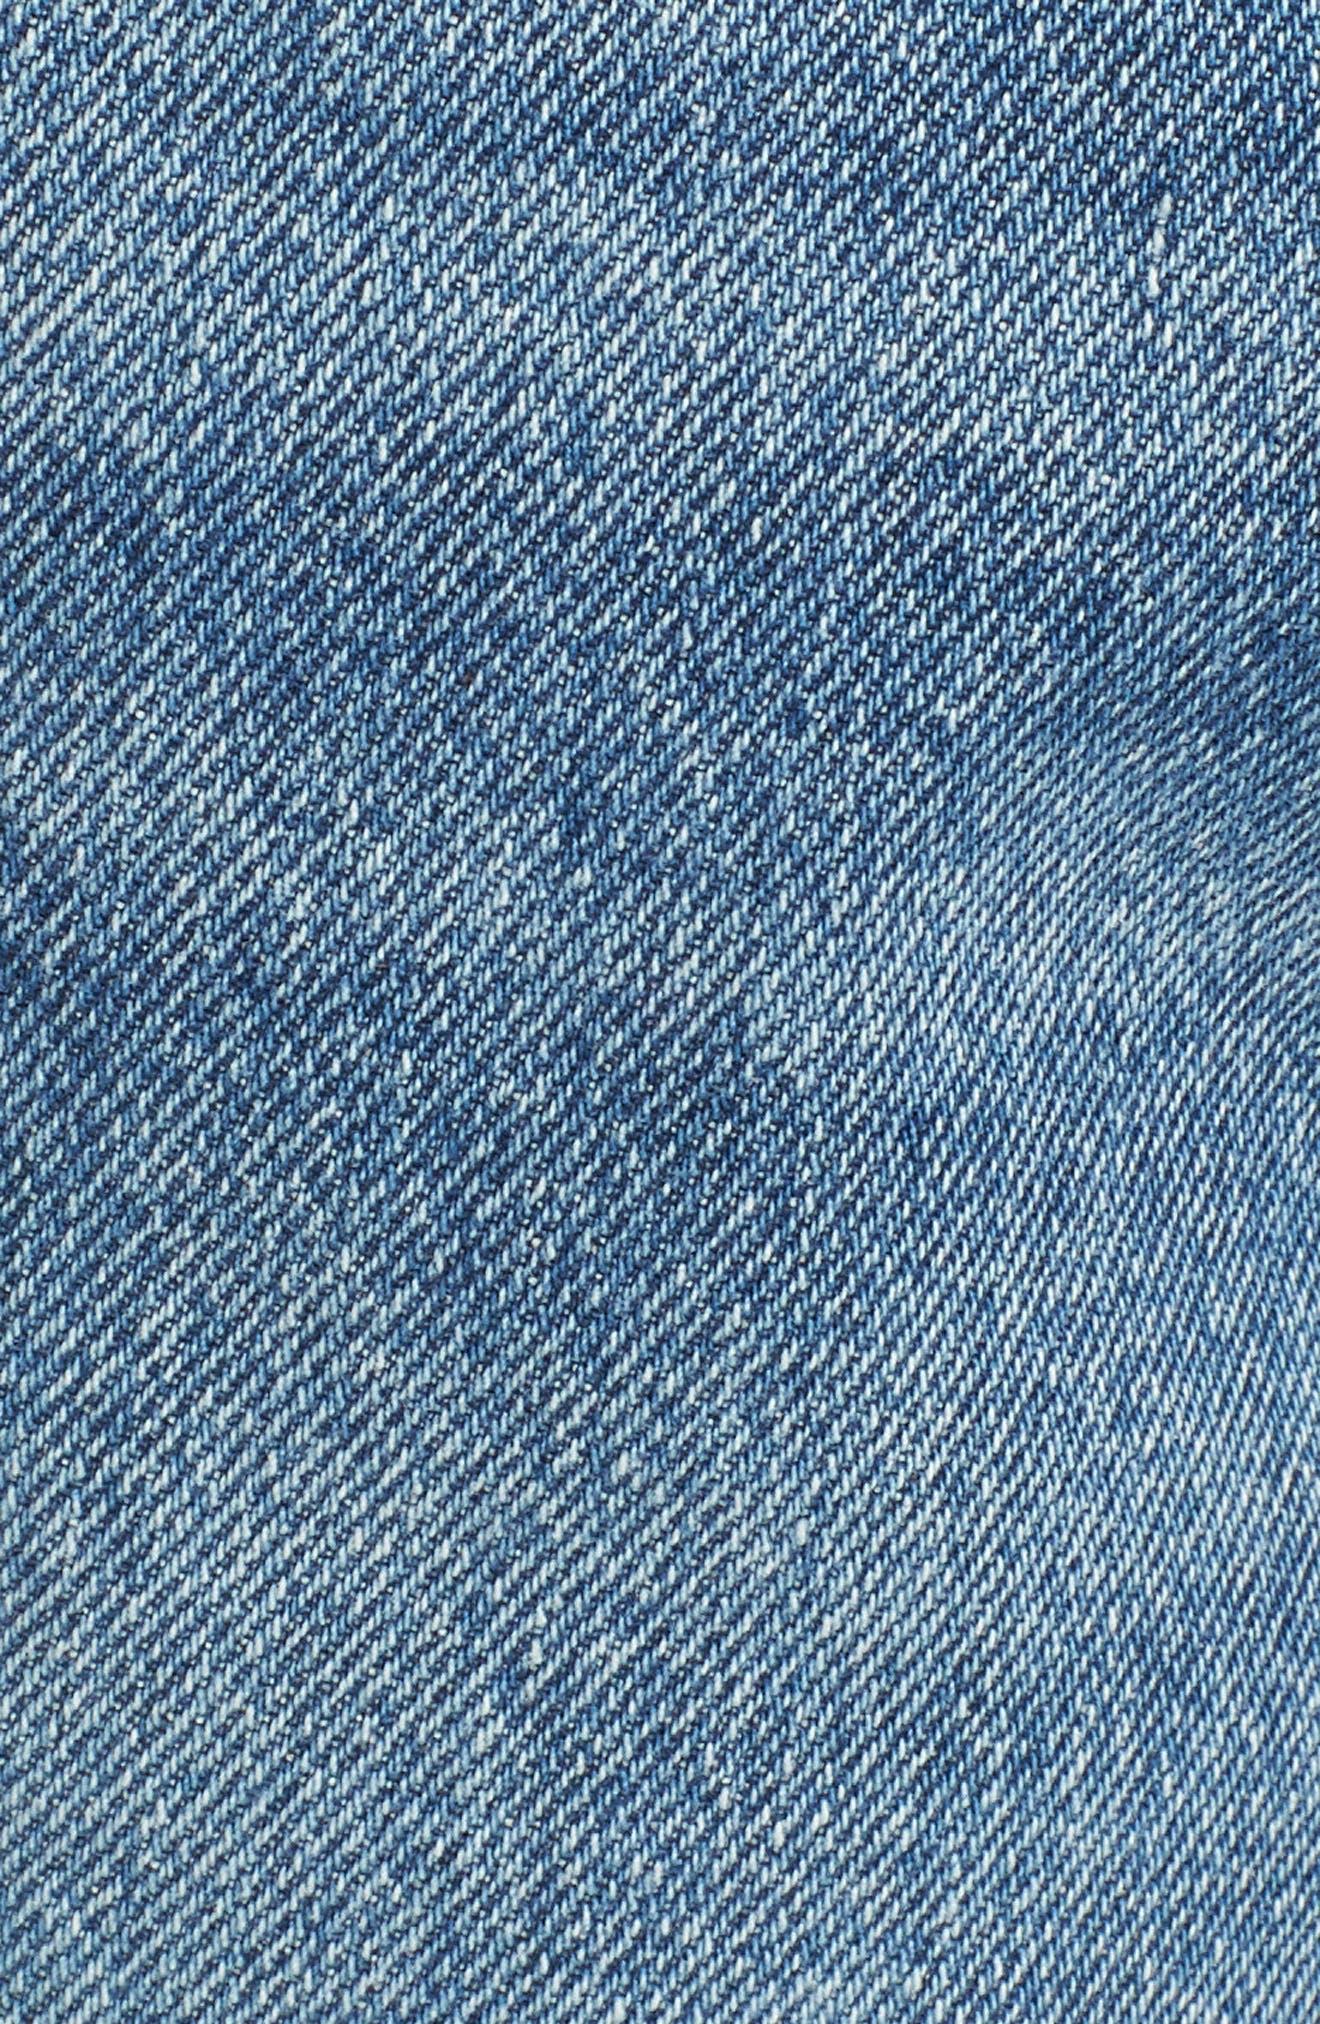 Cigarette High Waist Jeans,                             Alternate thumbnail 5, color,                             PASSENGER